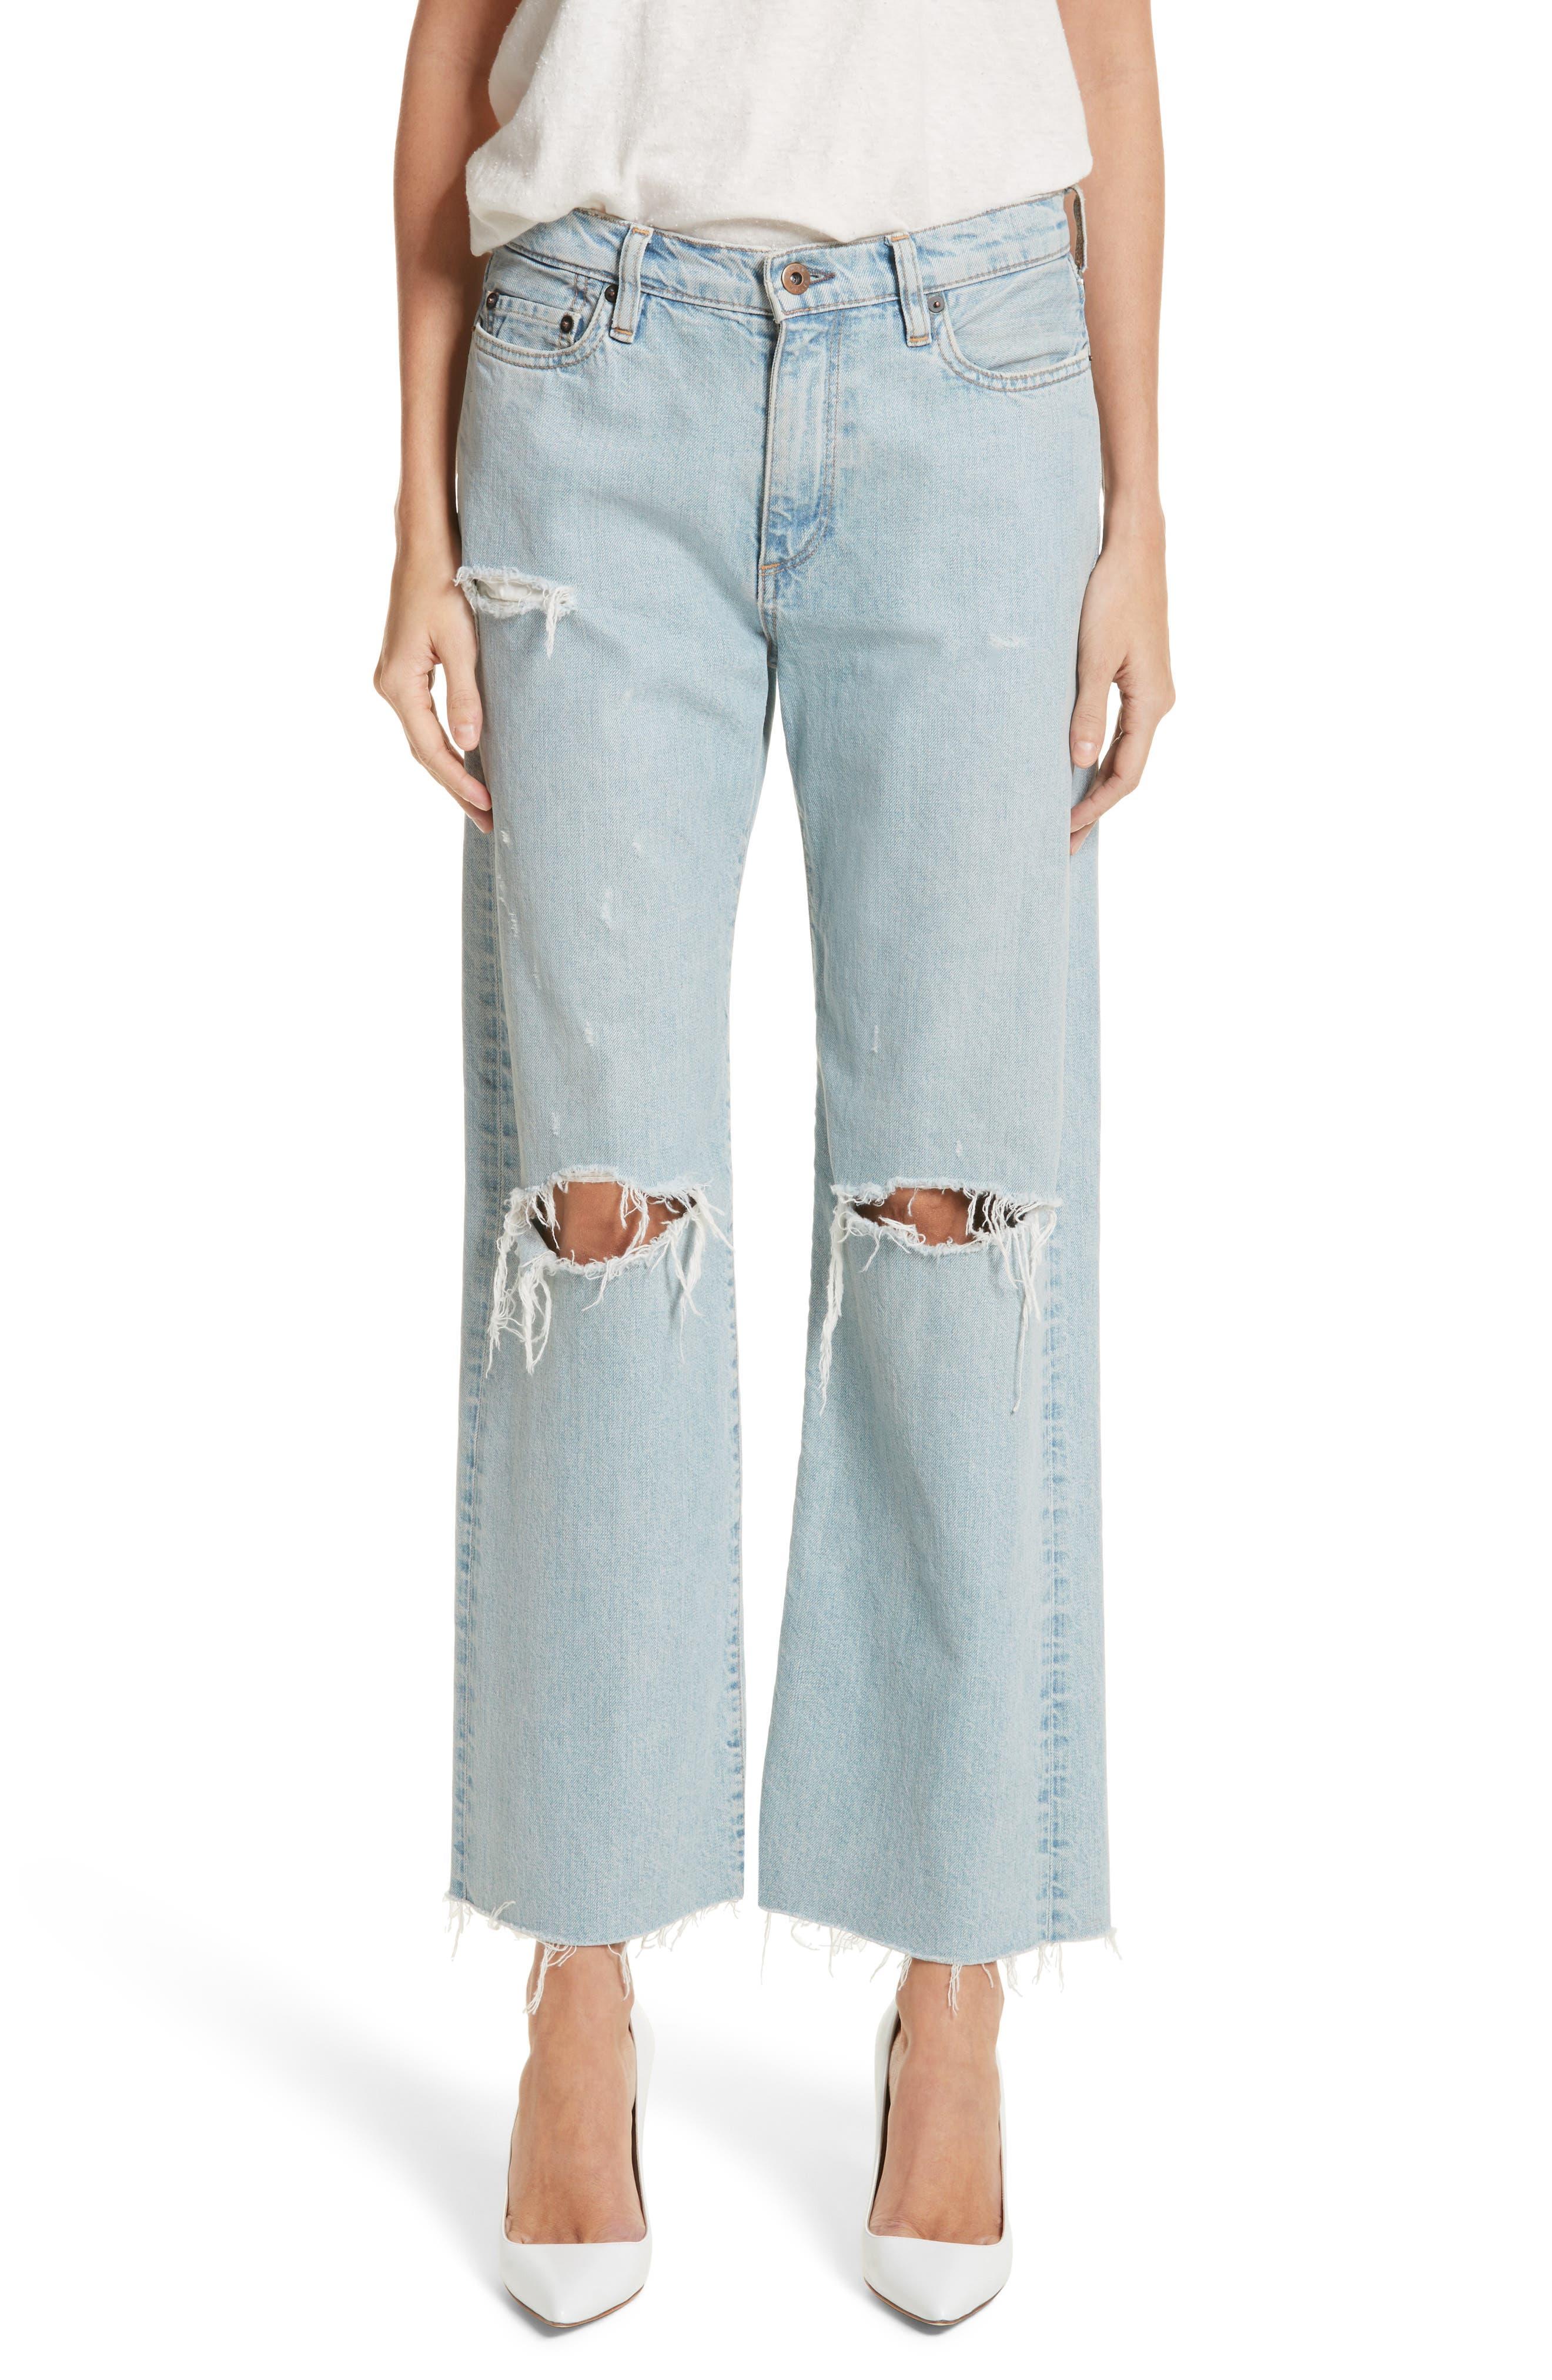 Tibbee Ripped Jeans,                         Main,                         color, Light Indigo